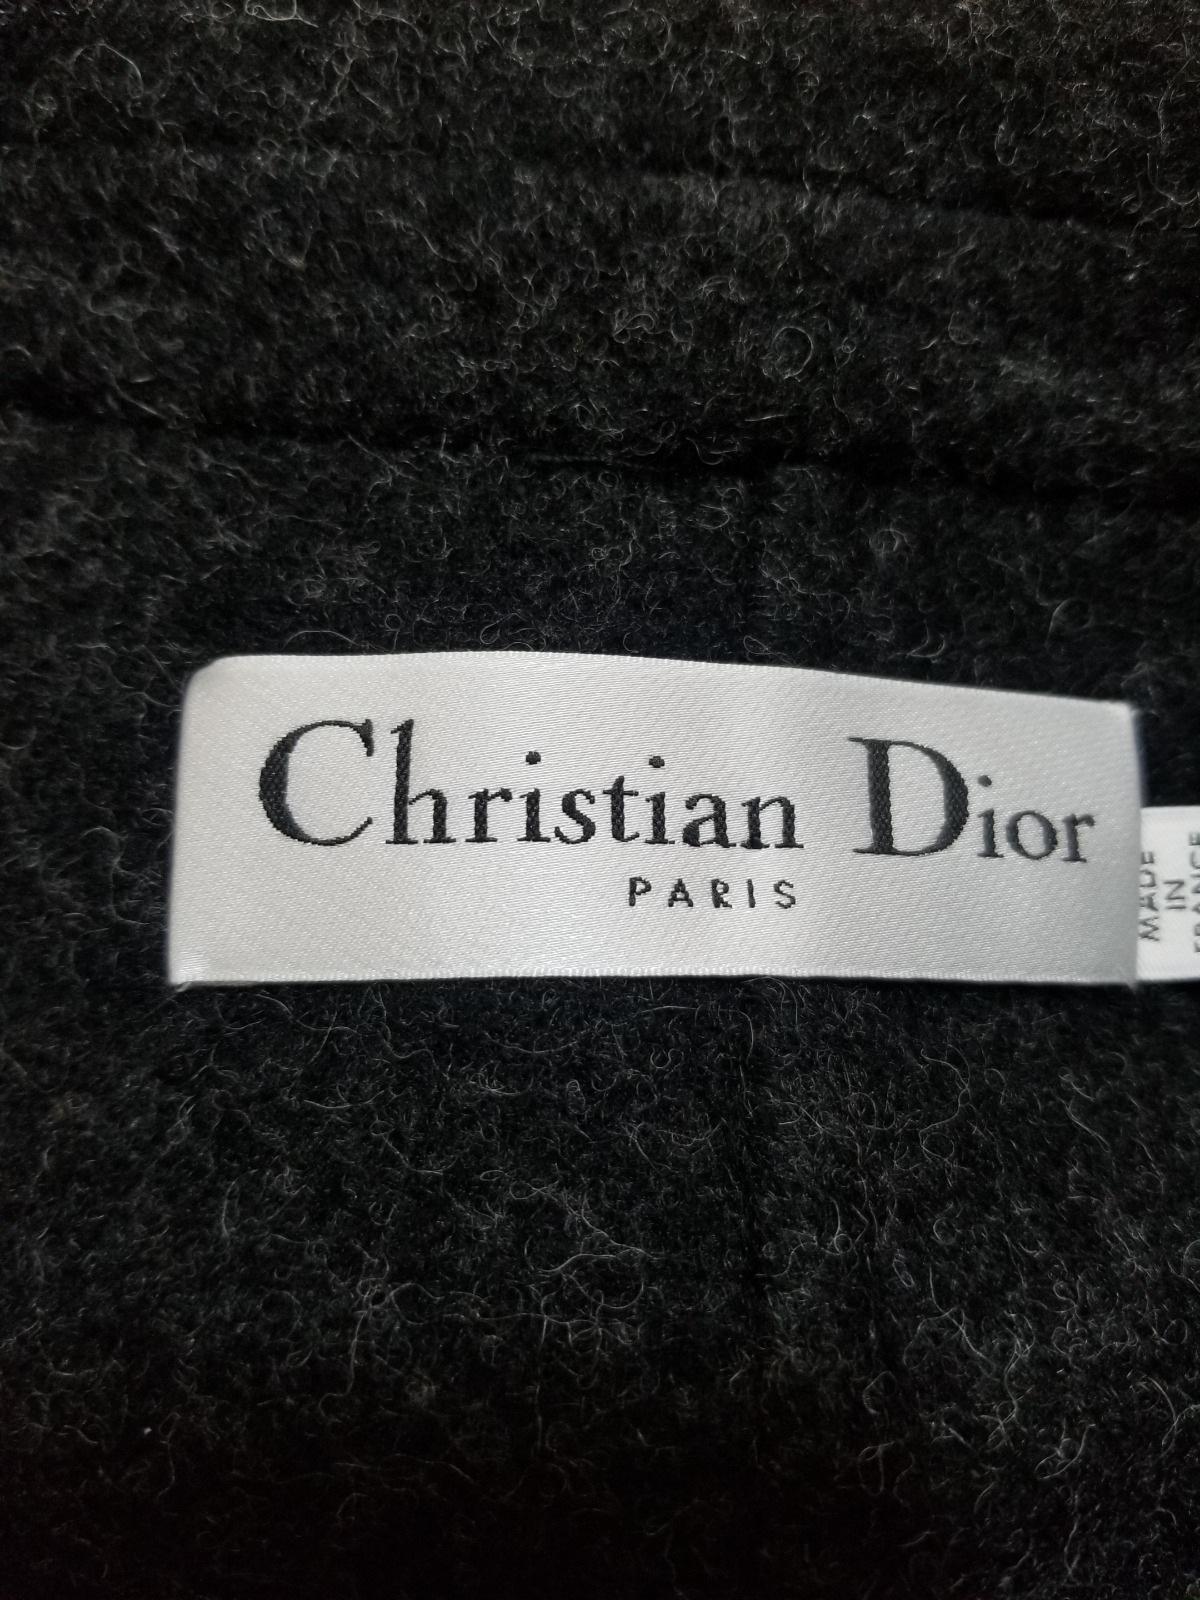 DIOR/ChristianDior(ディオール/クリスチャンディオール)のベスト